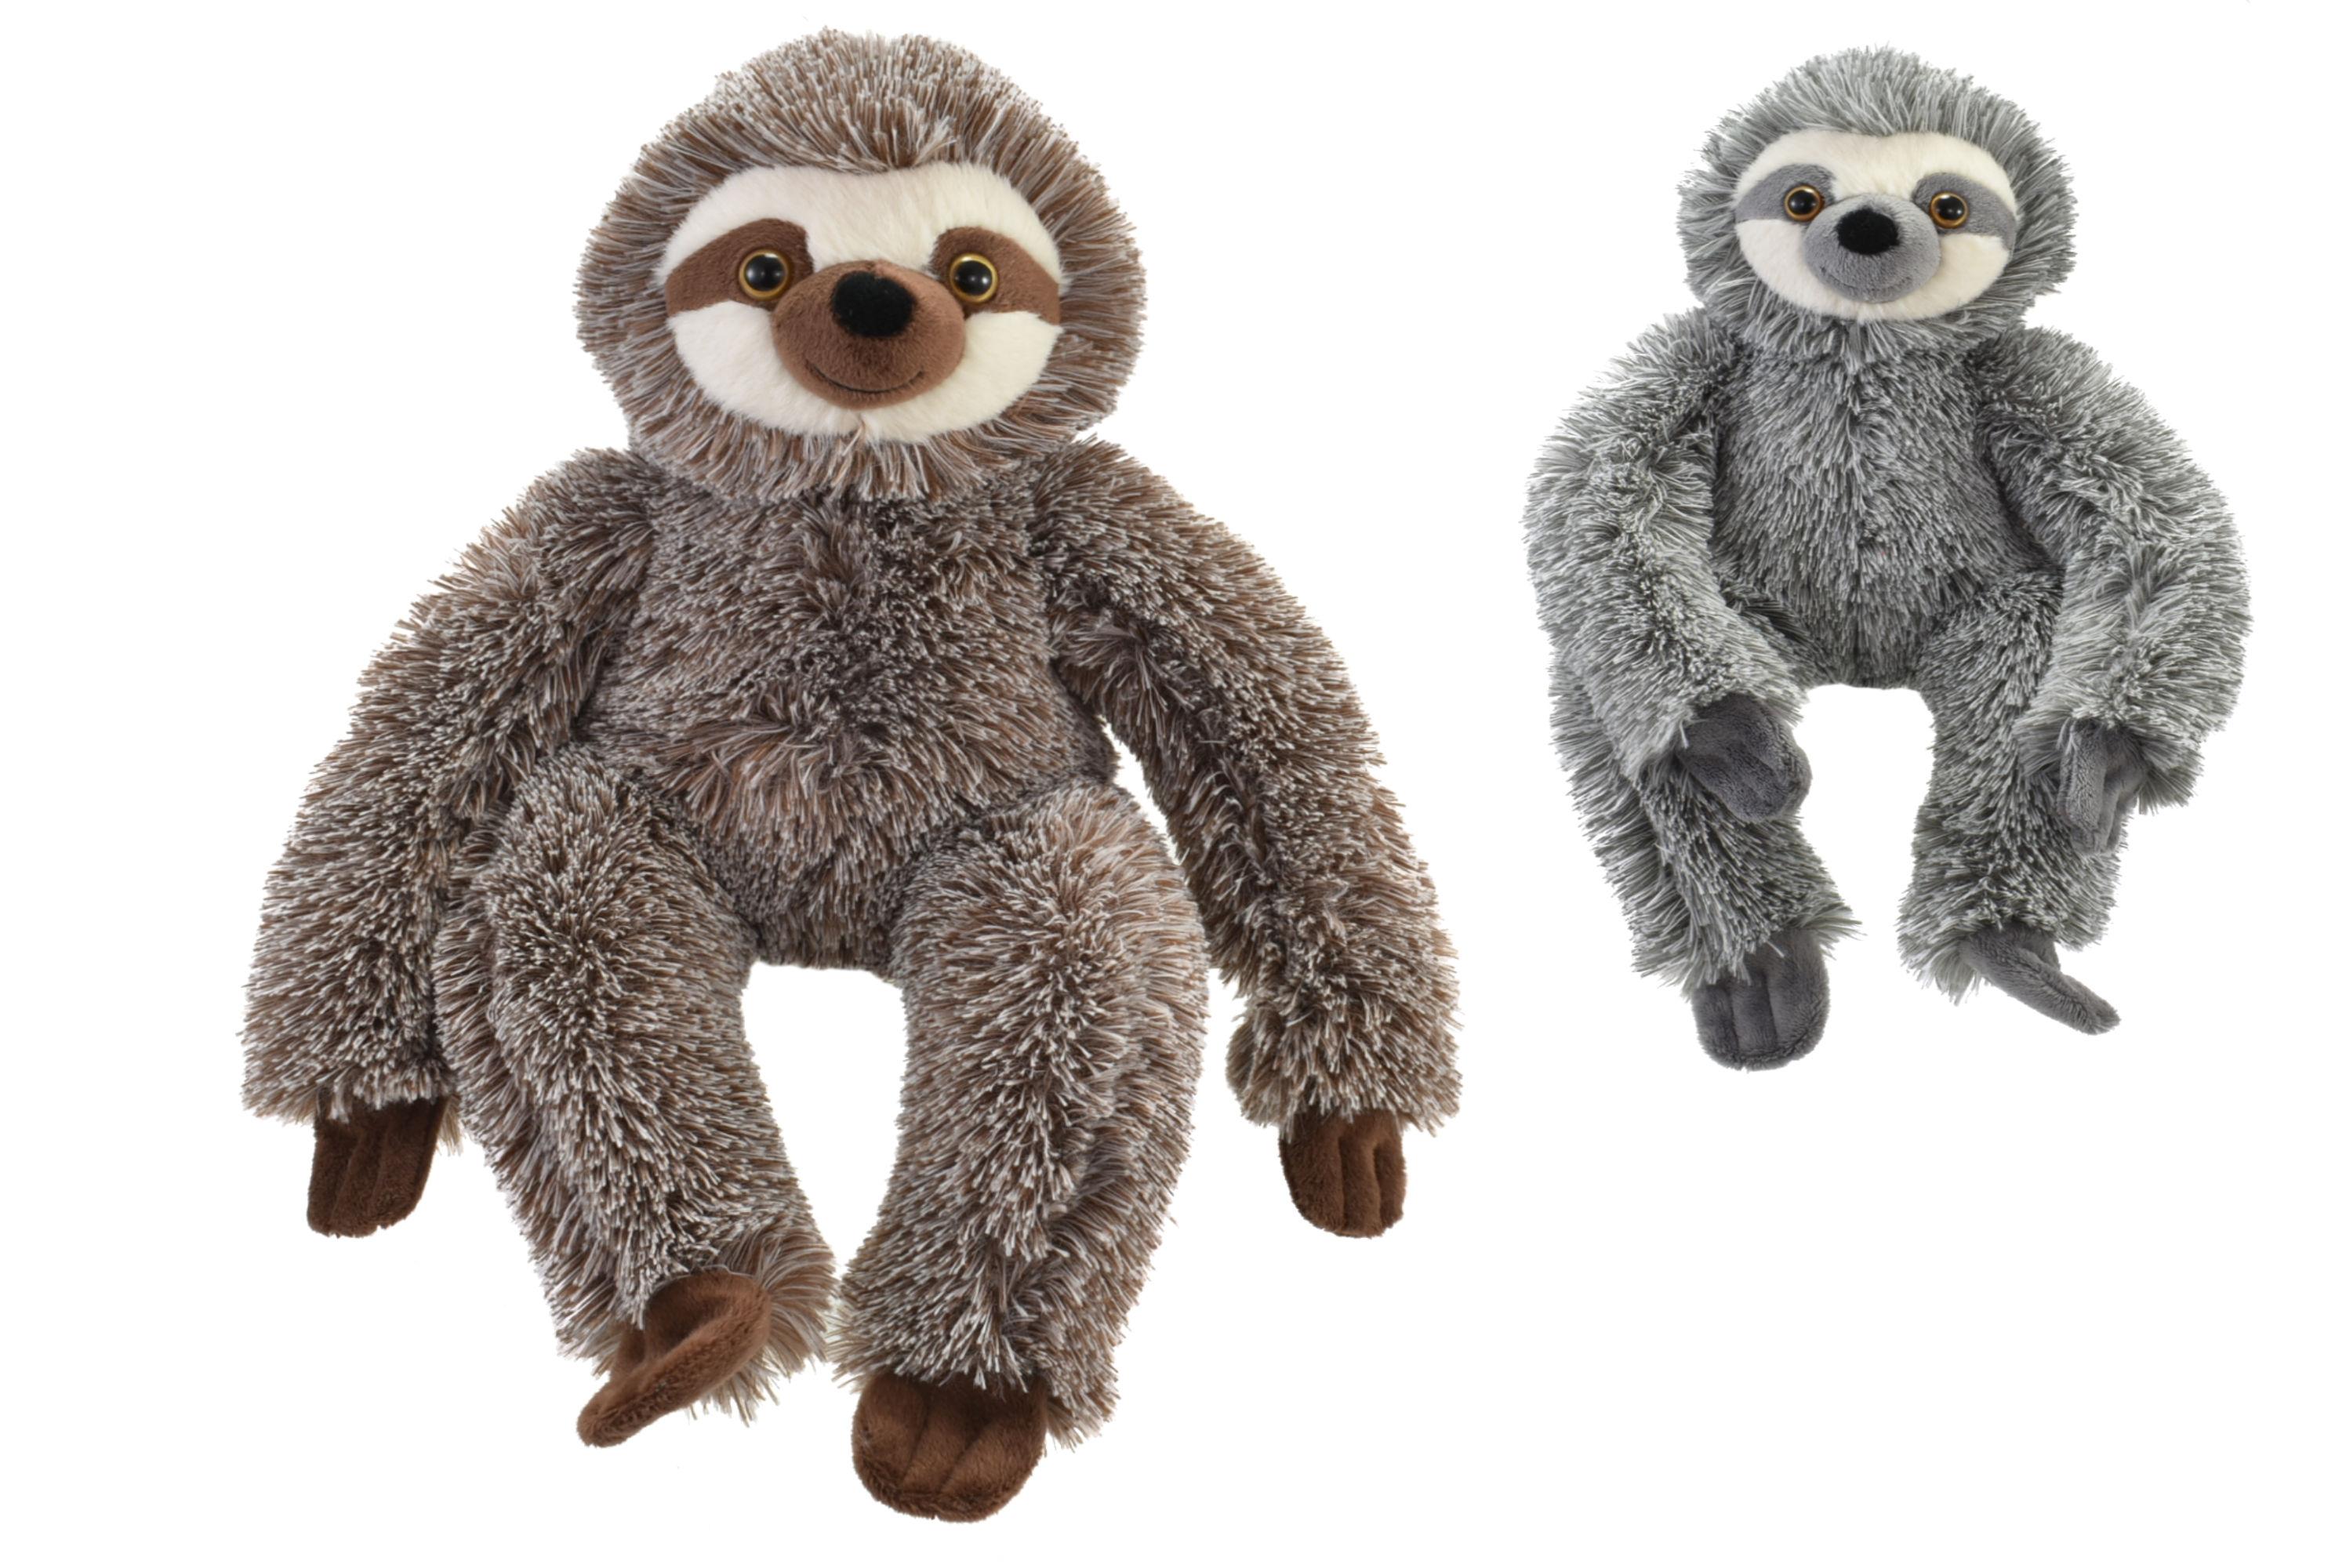 23cm Plush Sloth - 2 Assorted Colours